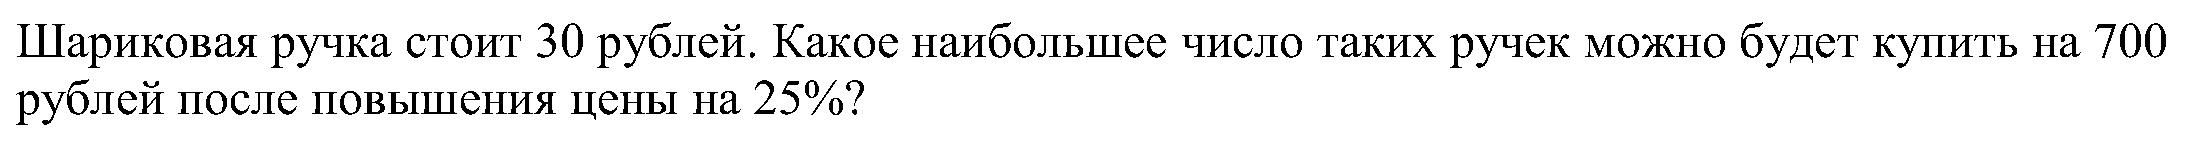 hello_html_m36ef2b1e.png